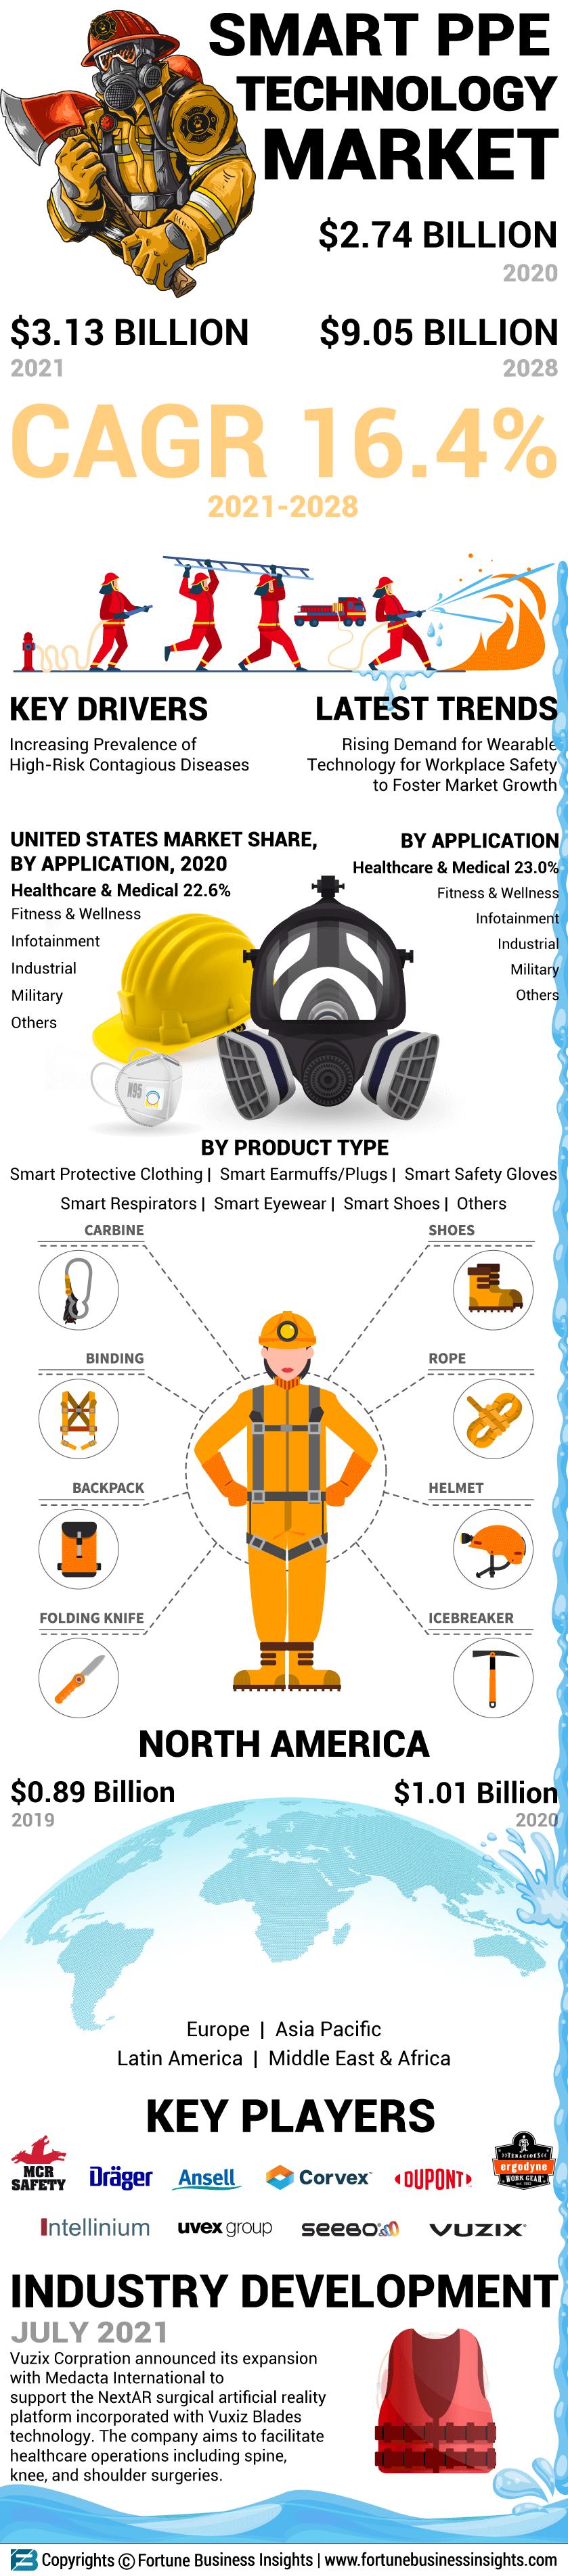 Smart PPE Technology Market